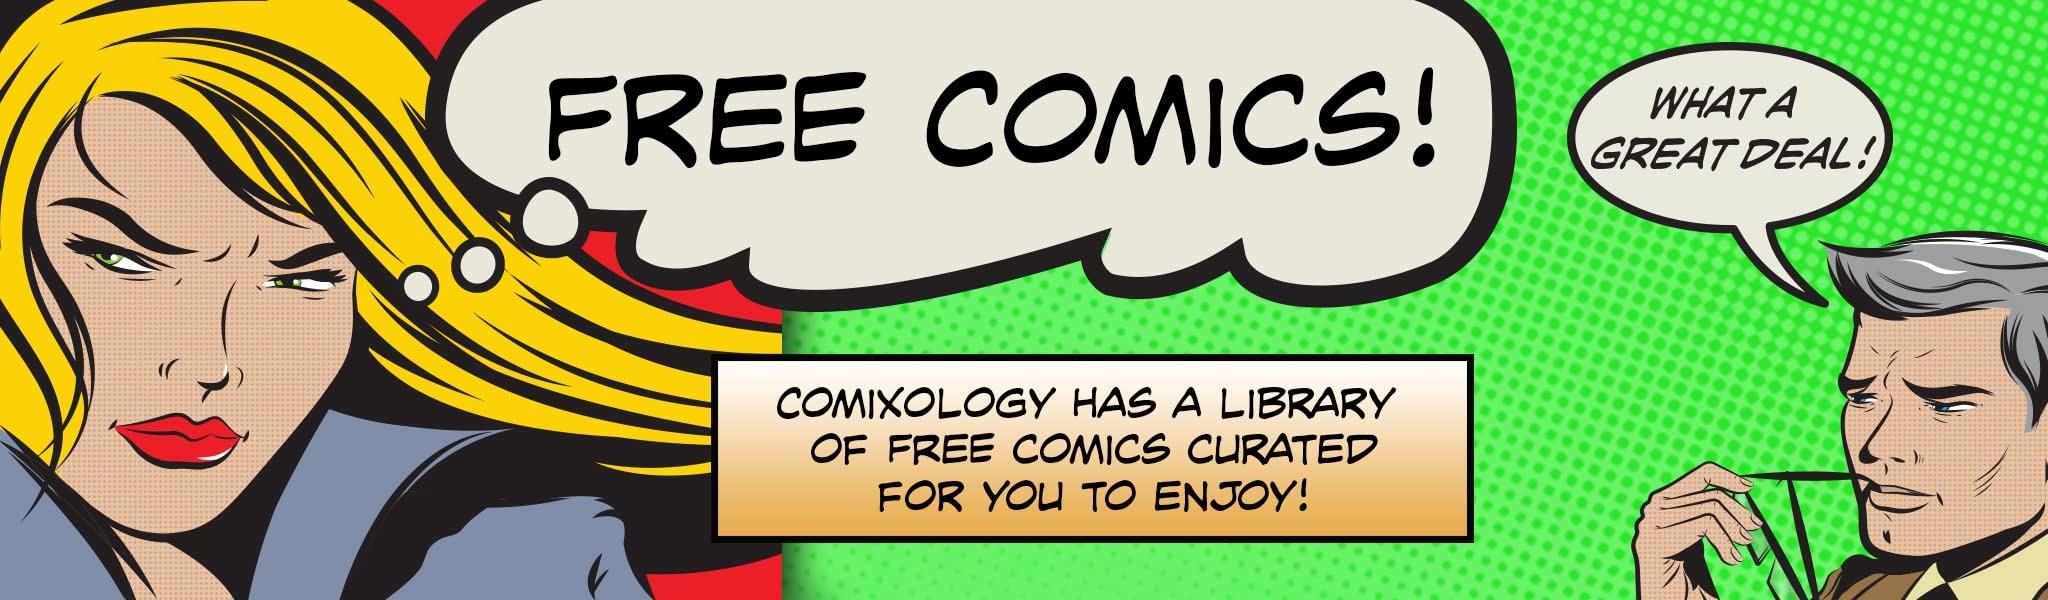 Neue kostenlose Comics bei Comixology